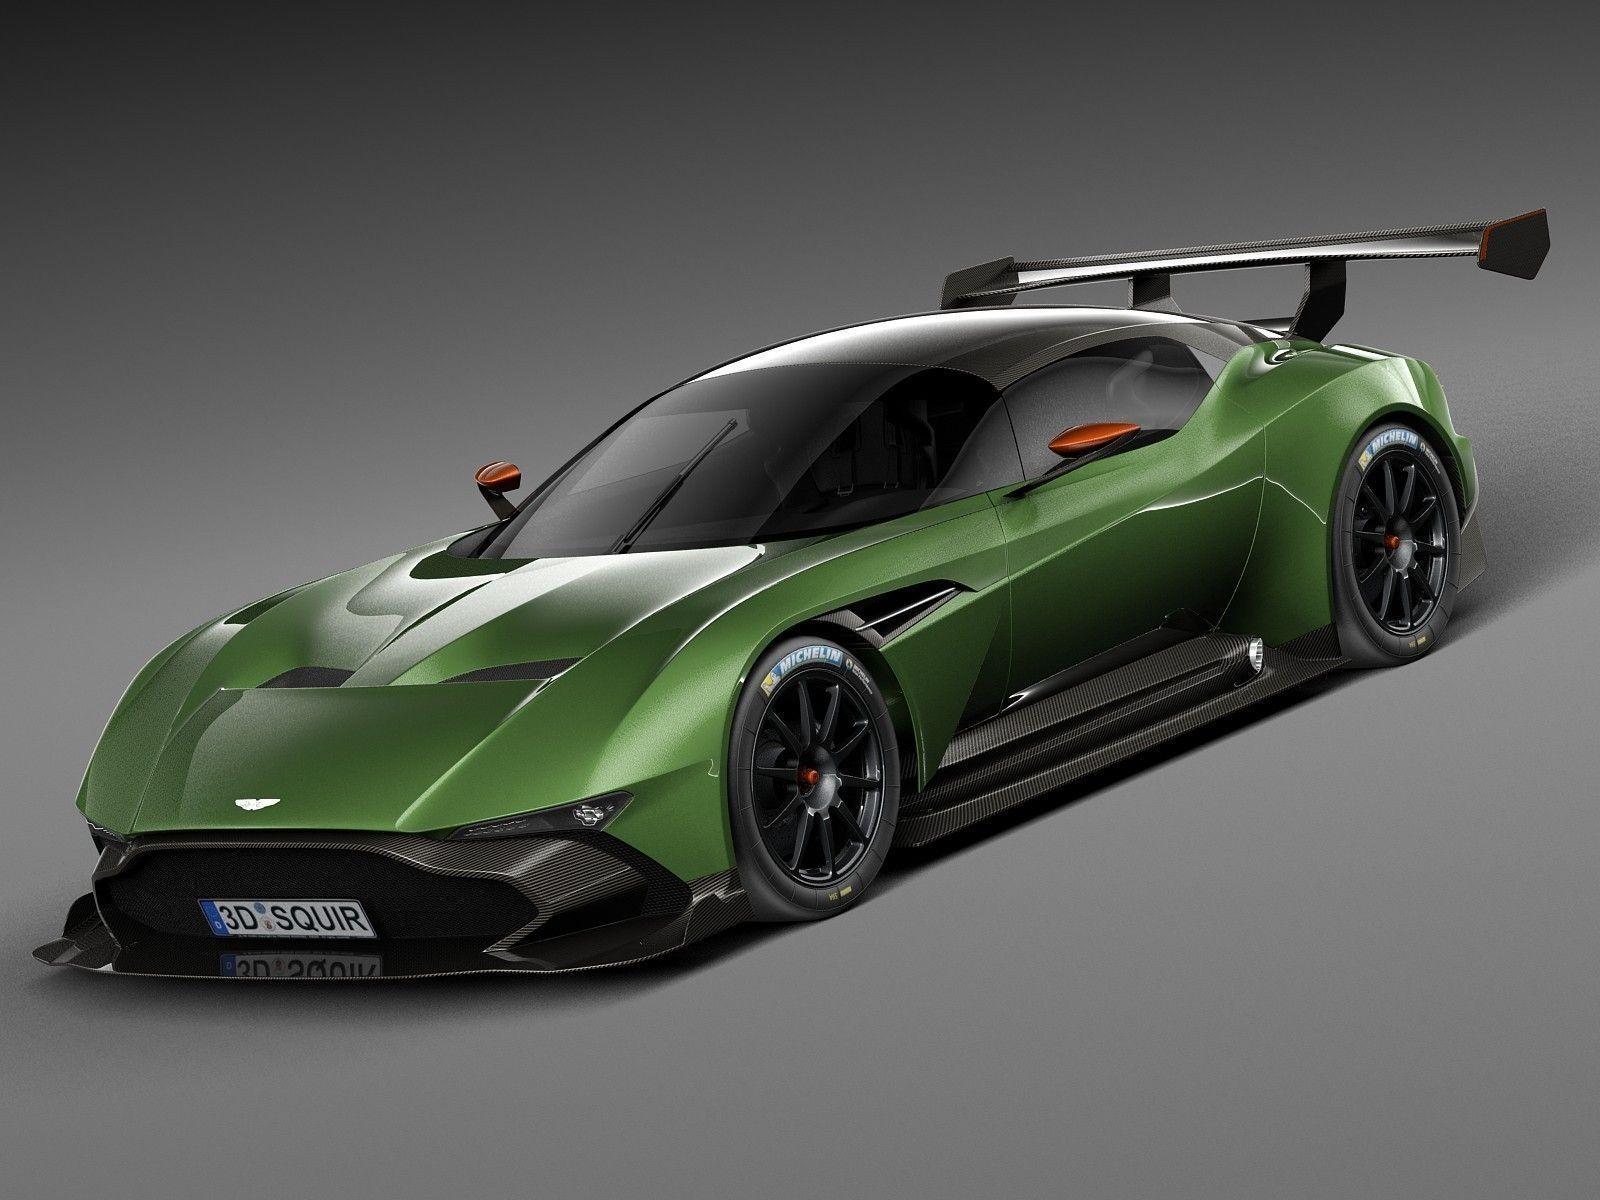 Aston martin vulcan 2016 3d model max obj 3ds fbx c4d lwo for Cgpersia